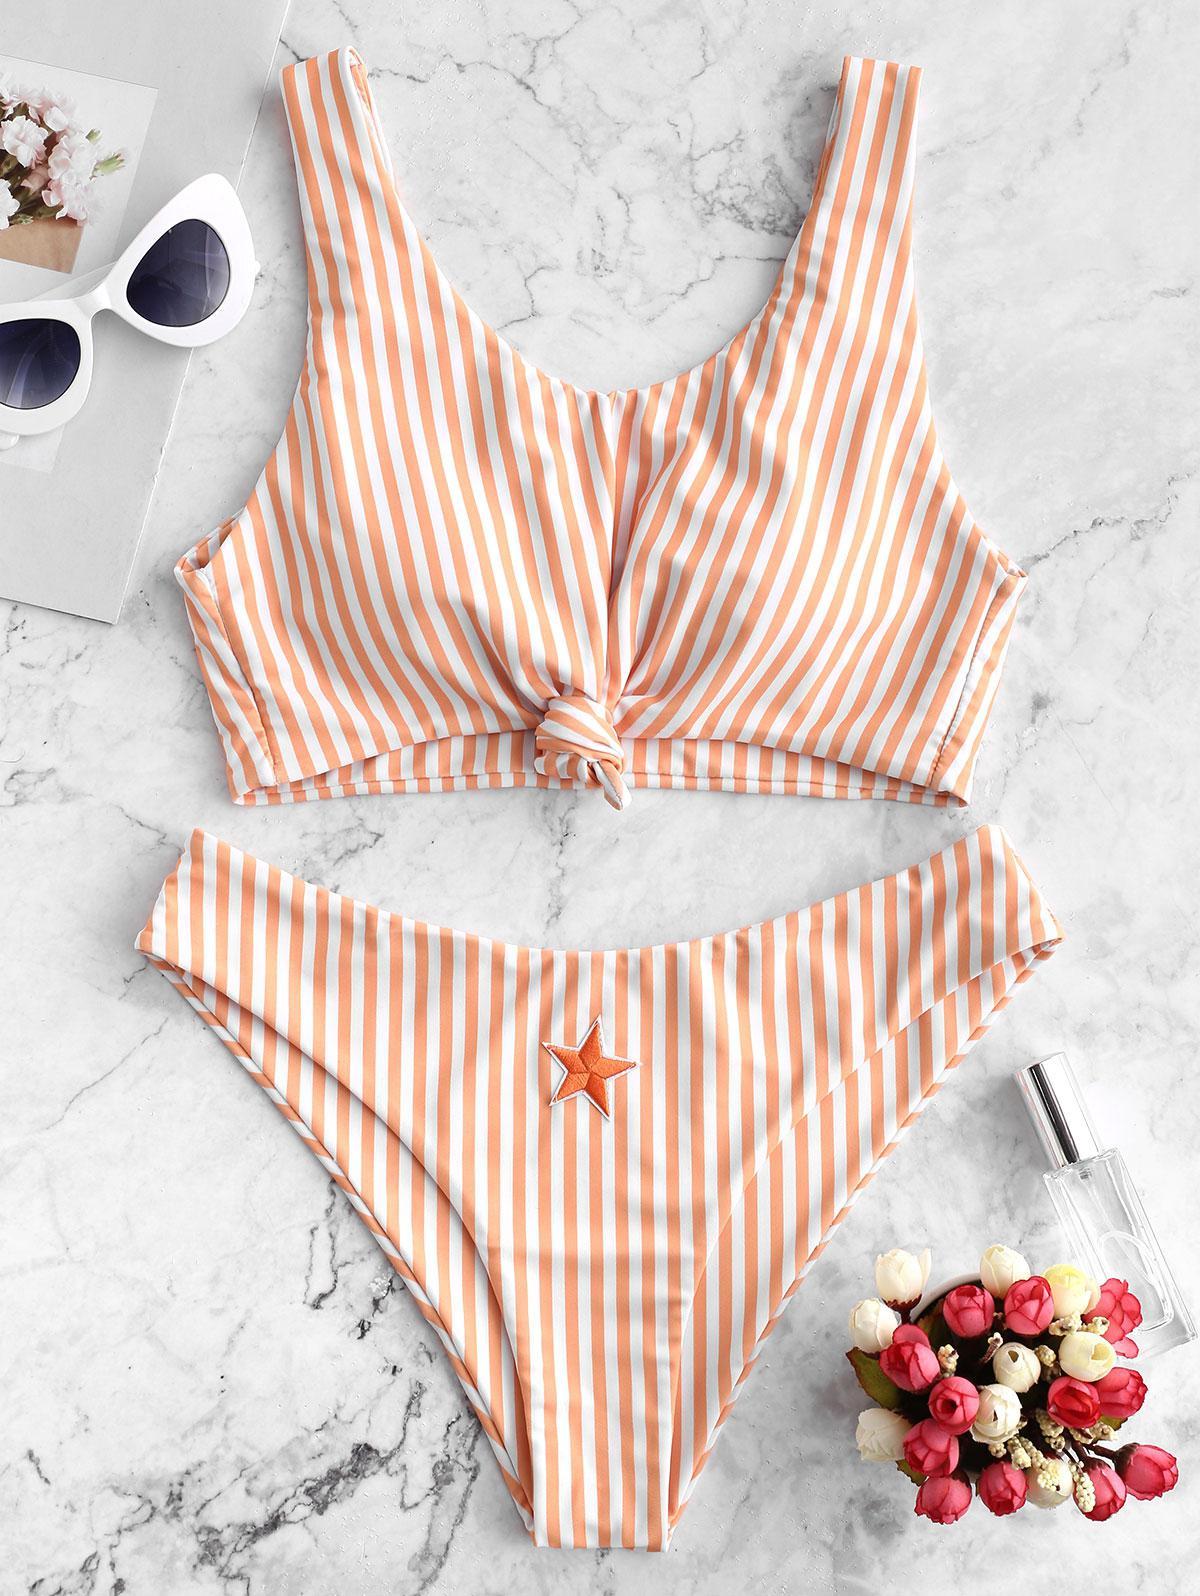 ZAFUL Knot Star Patch Striped Bikini Swimsuit фото